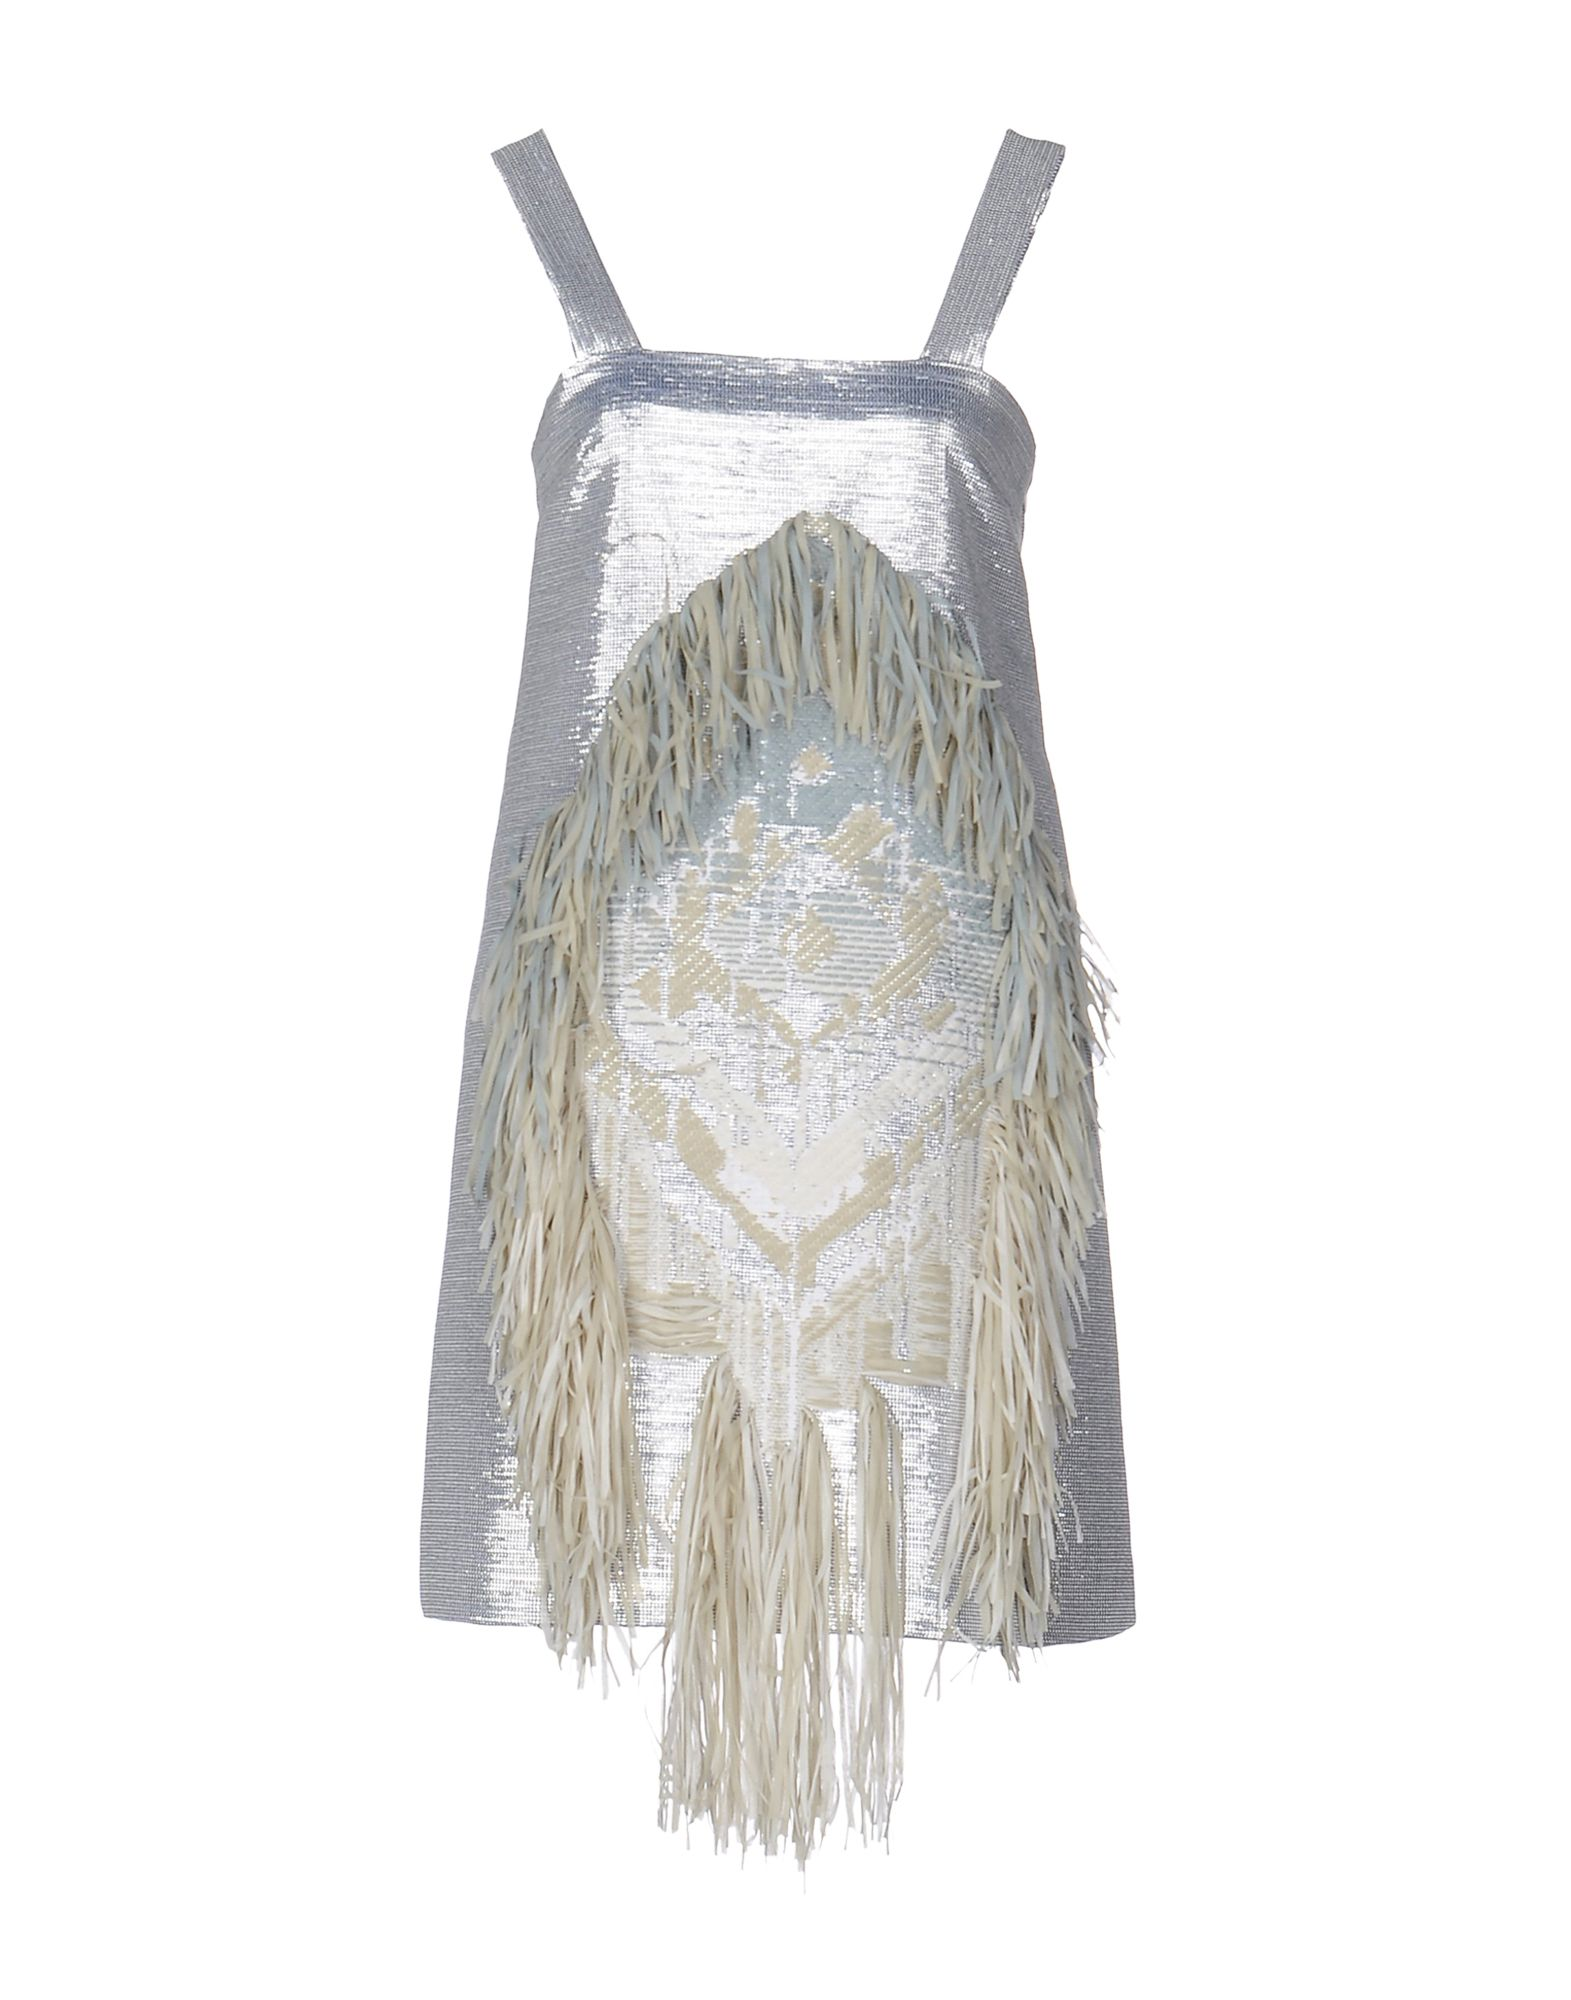 VANDA CATUCCI Короткое платье vanda robert s delight купить